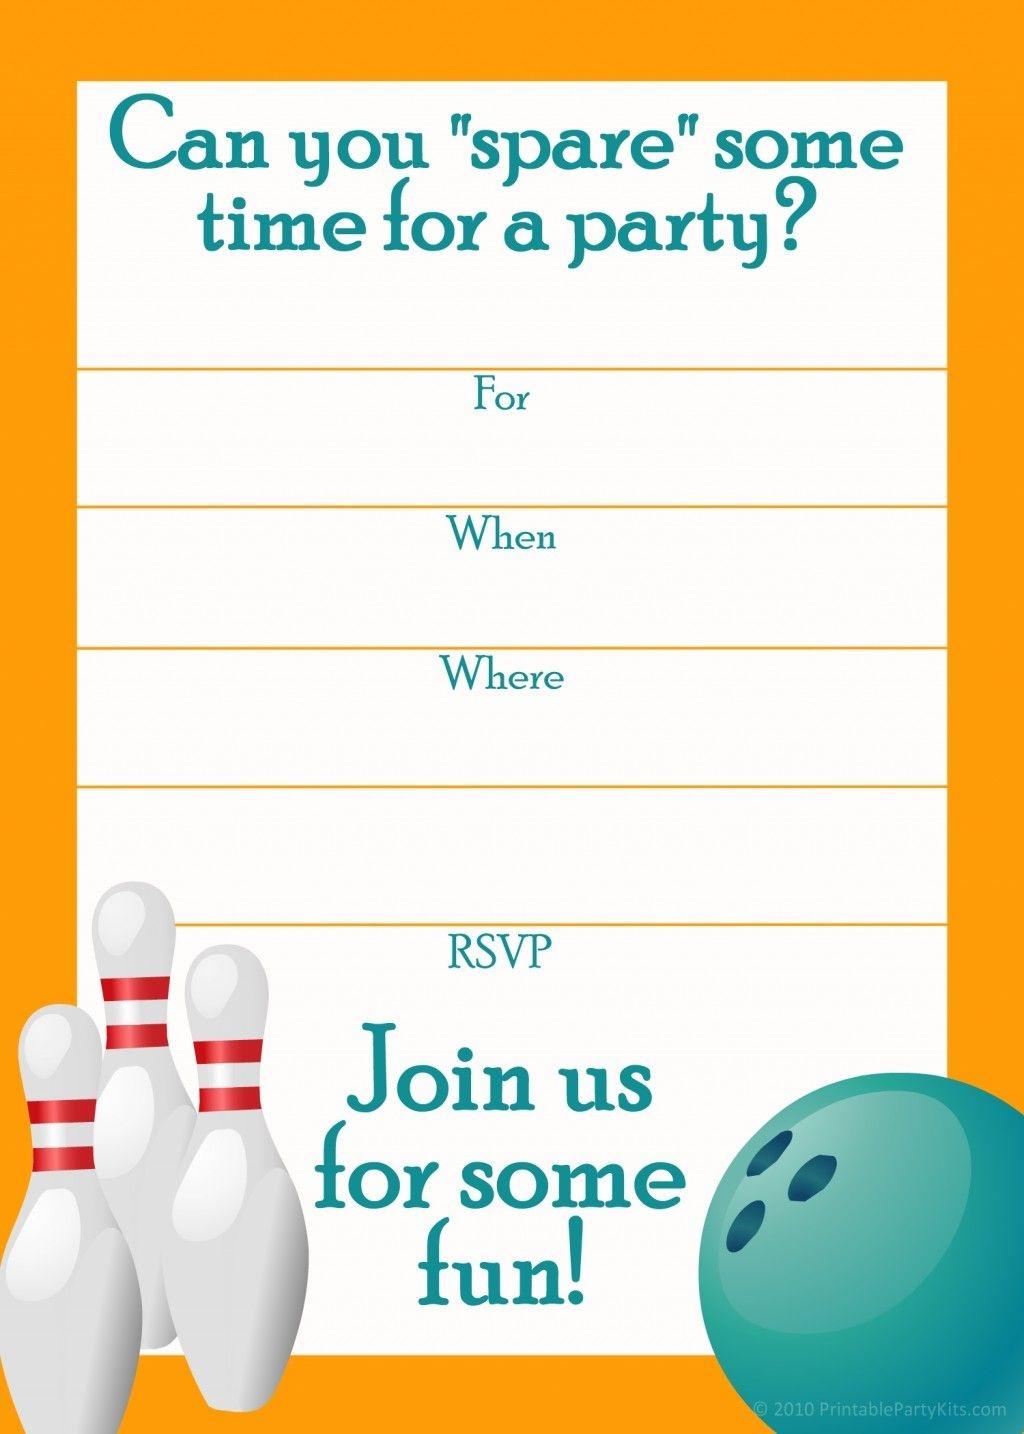 Free Printable Sports Birthday Party Invitations Templates | Dakota - Free Printable Sports Birthday Invitation Templates